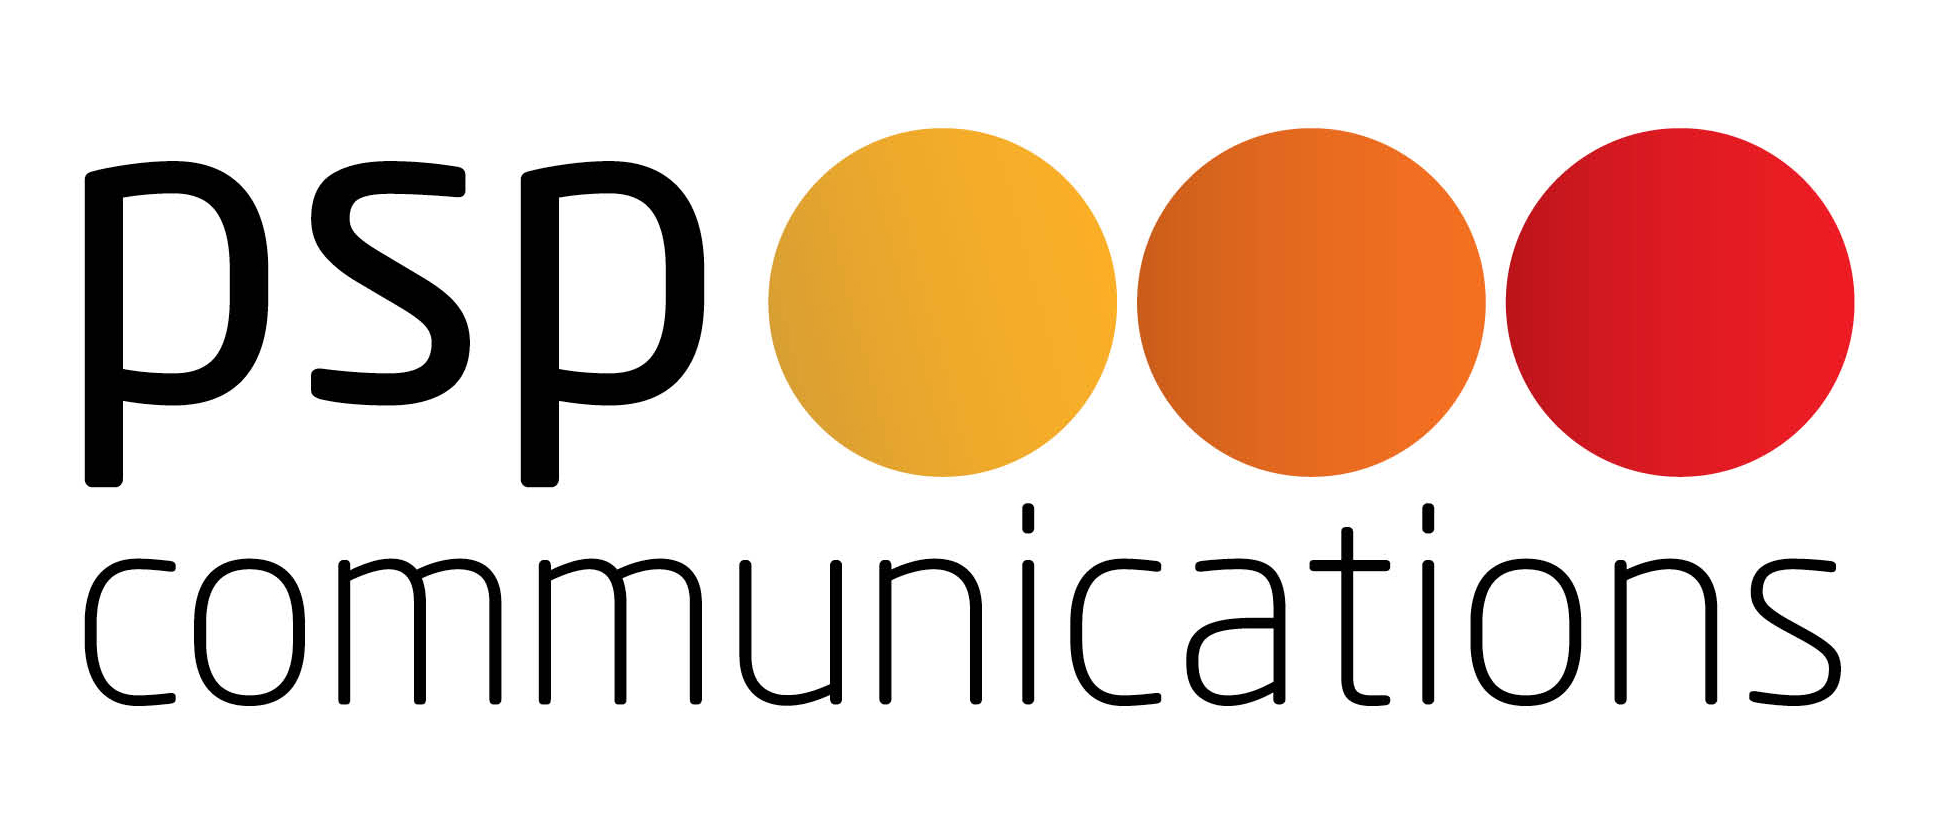 PSP communications